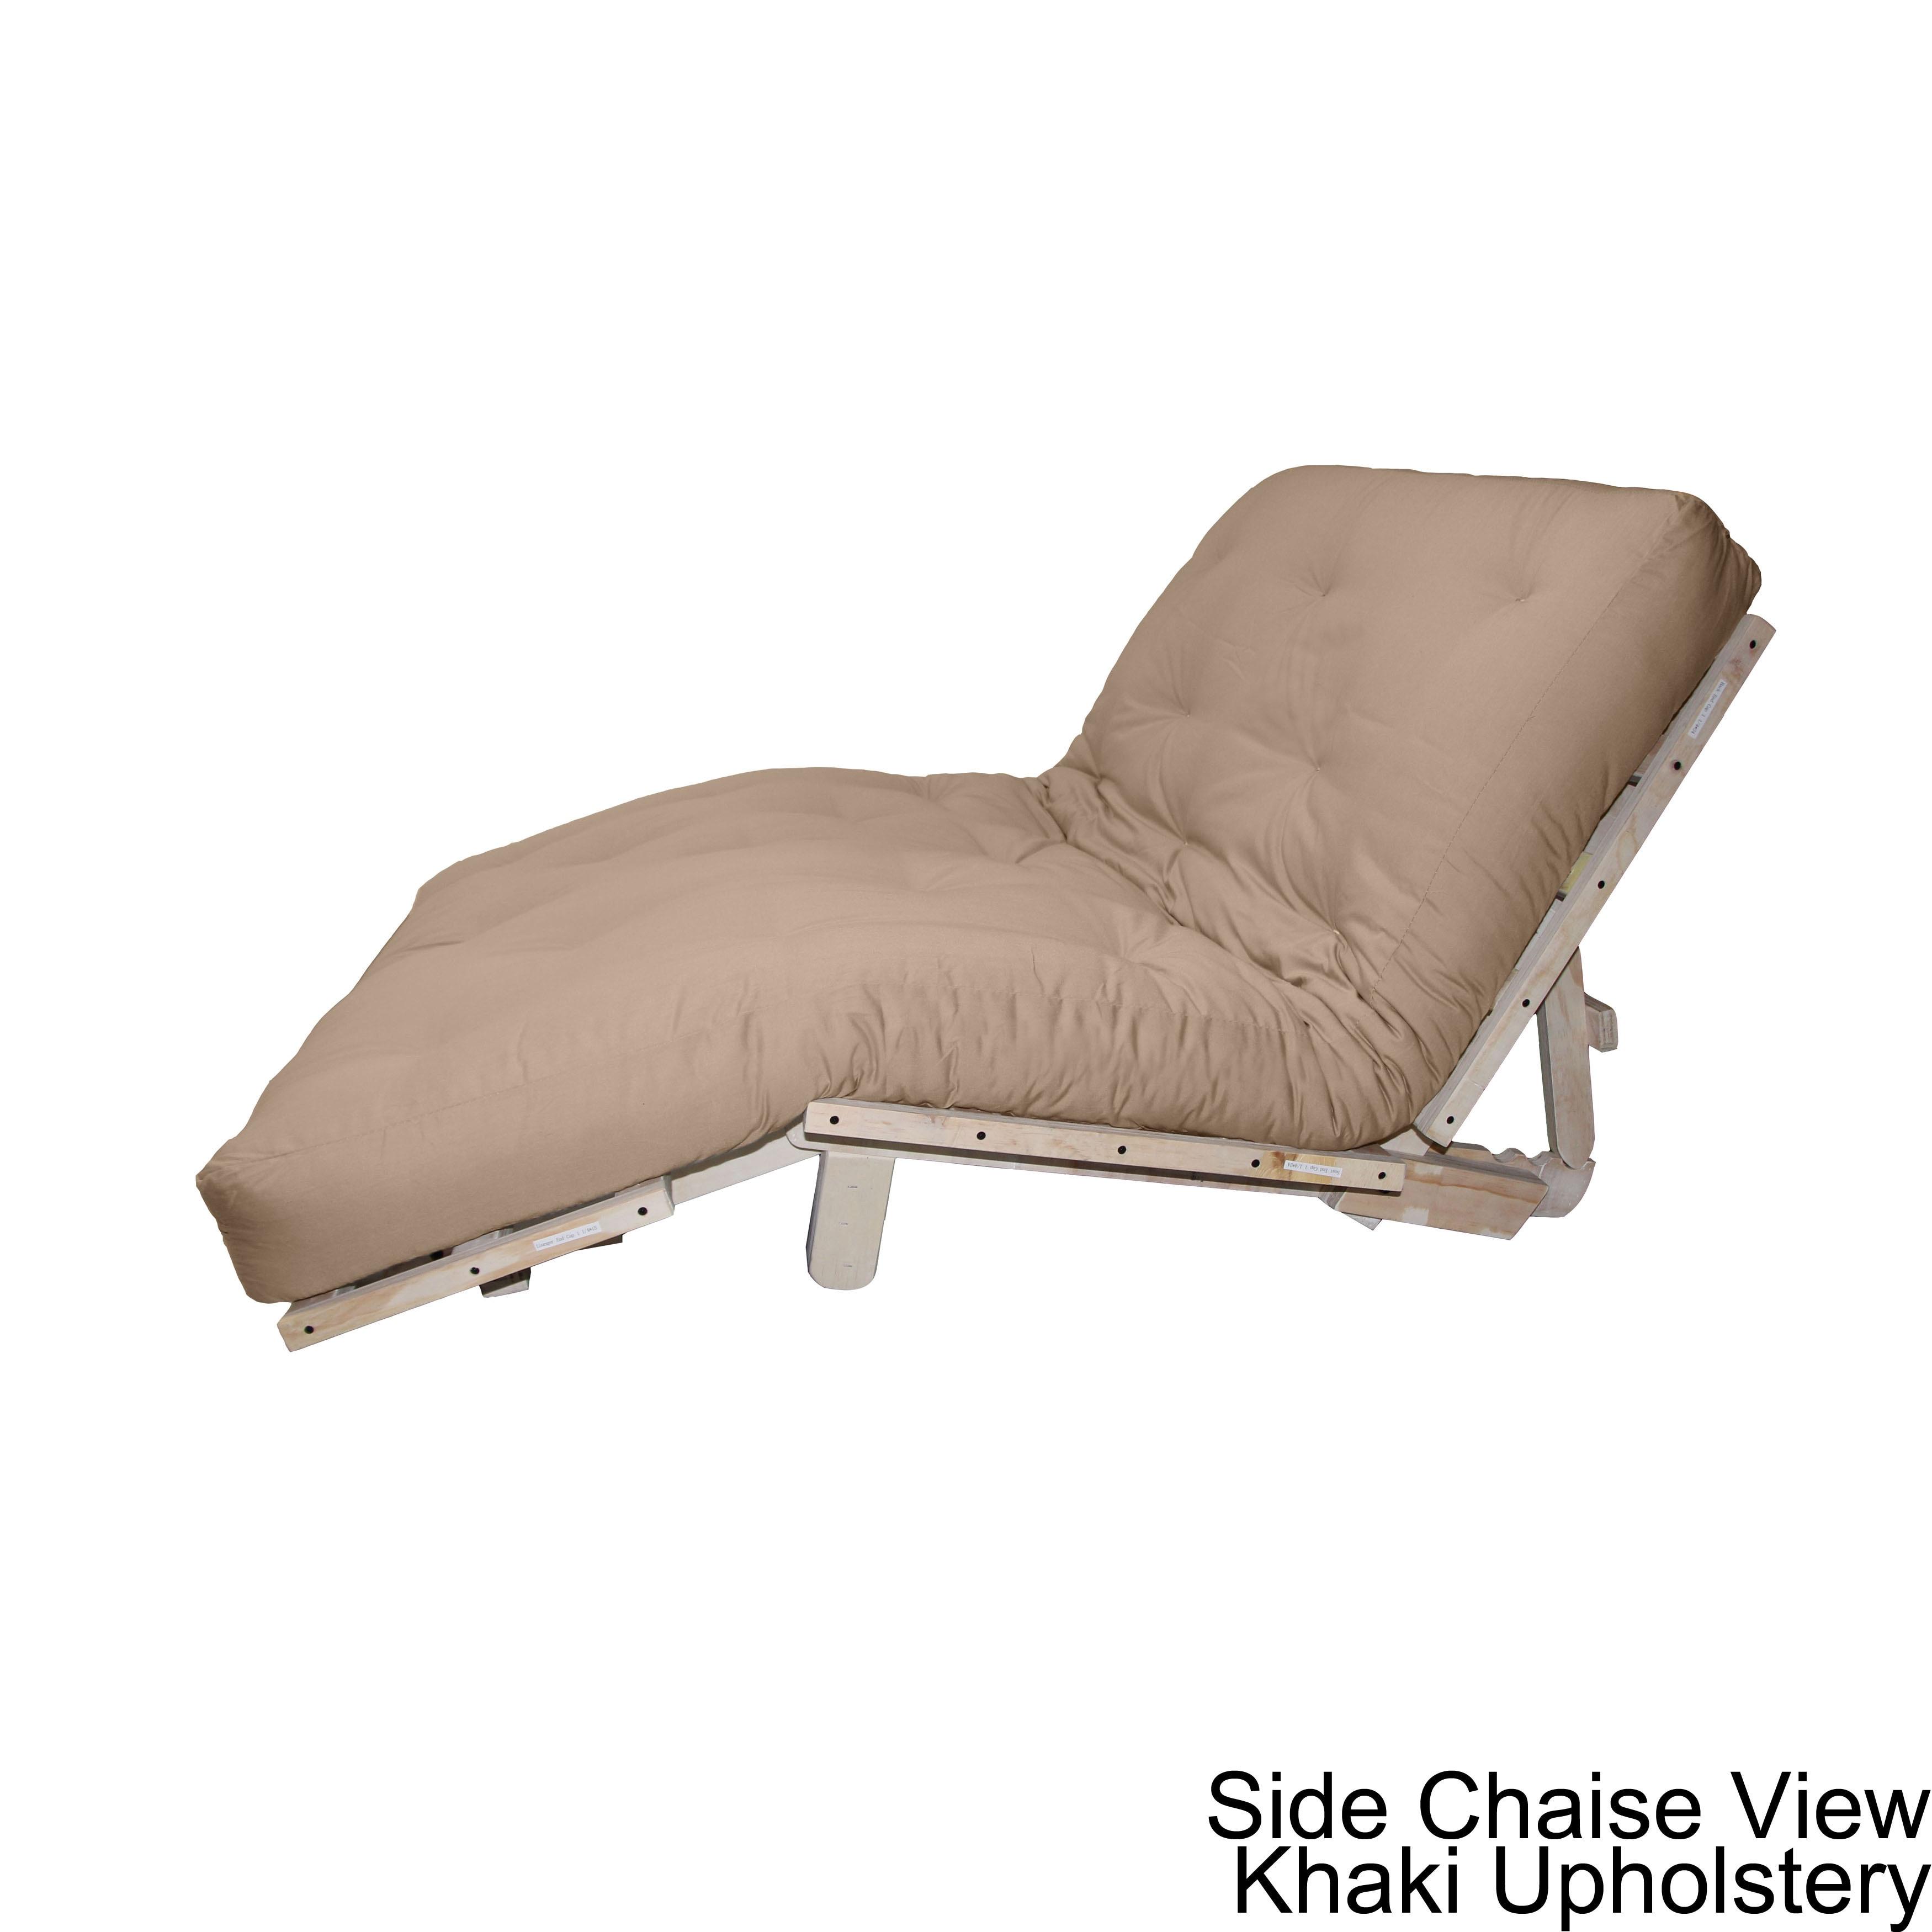 design comfort of on japanese big futons to comfortable image great fence sleep roof amazon futon